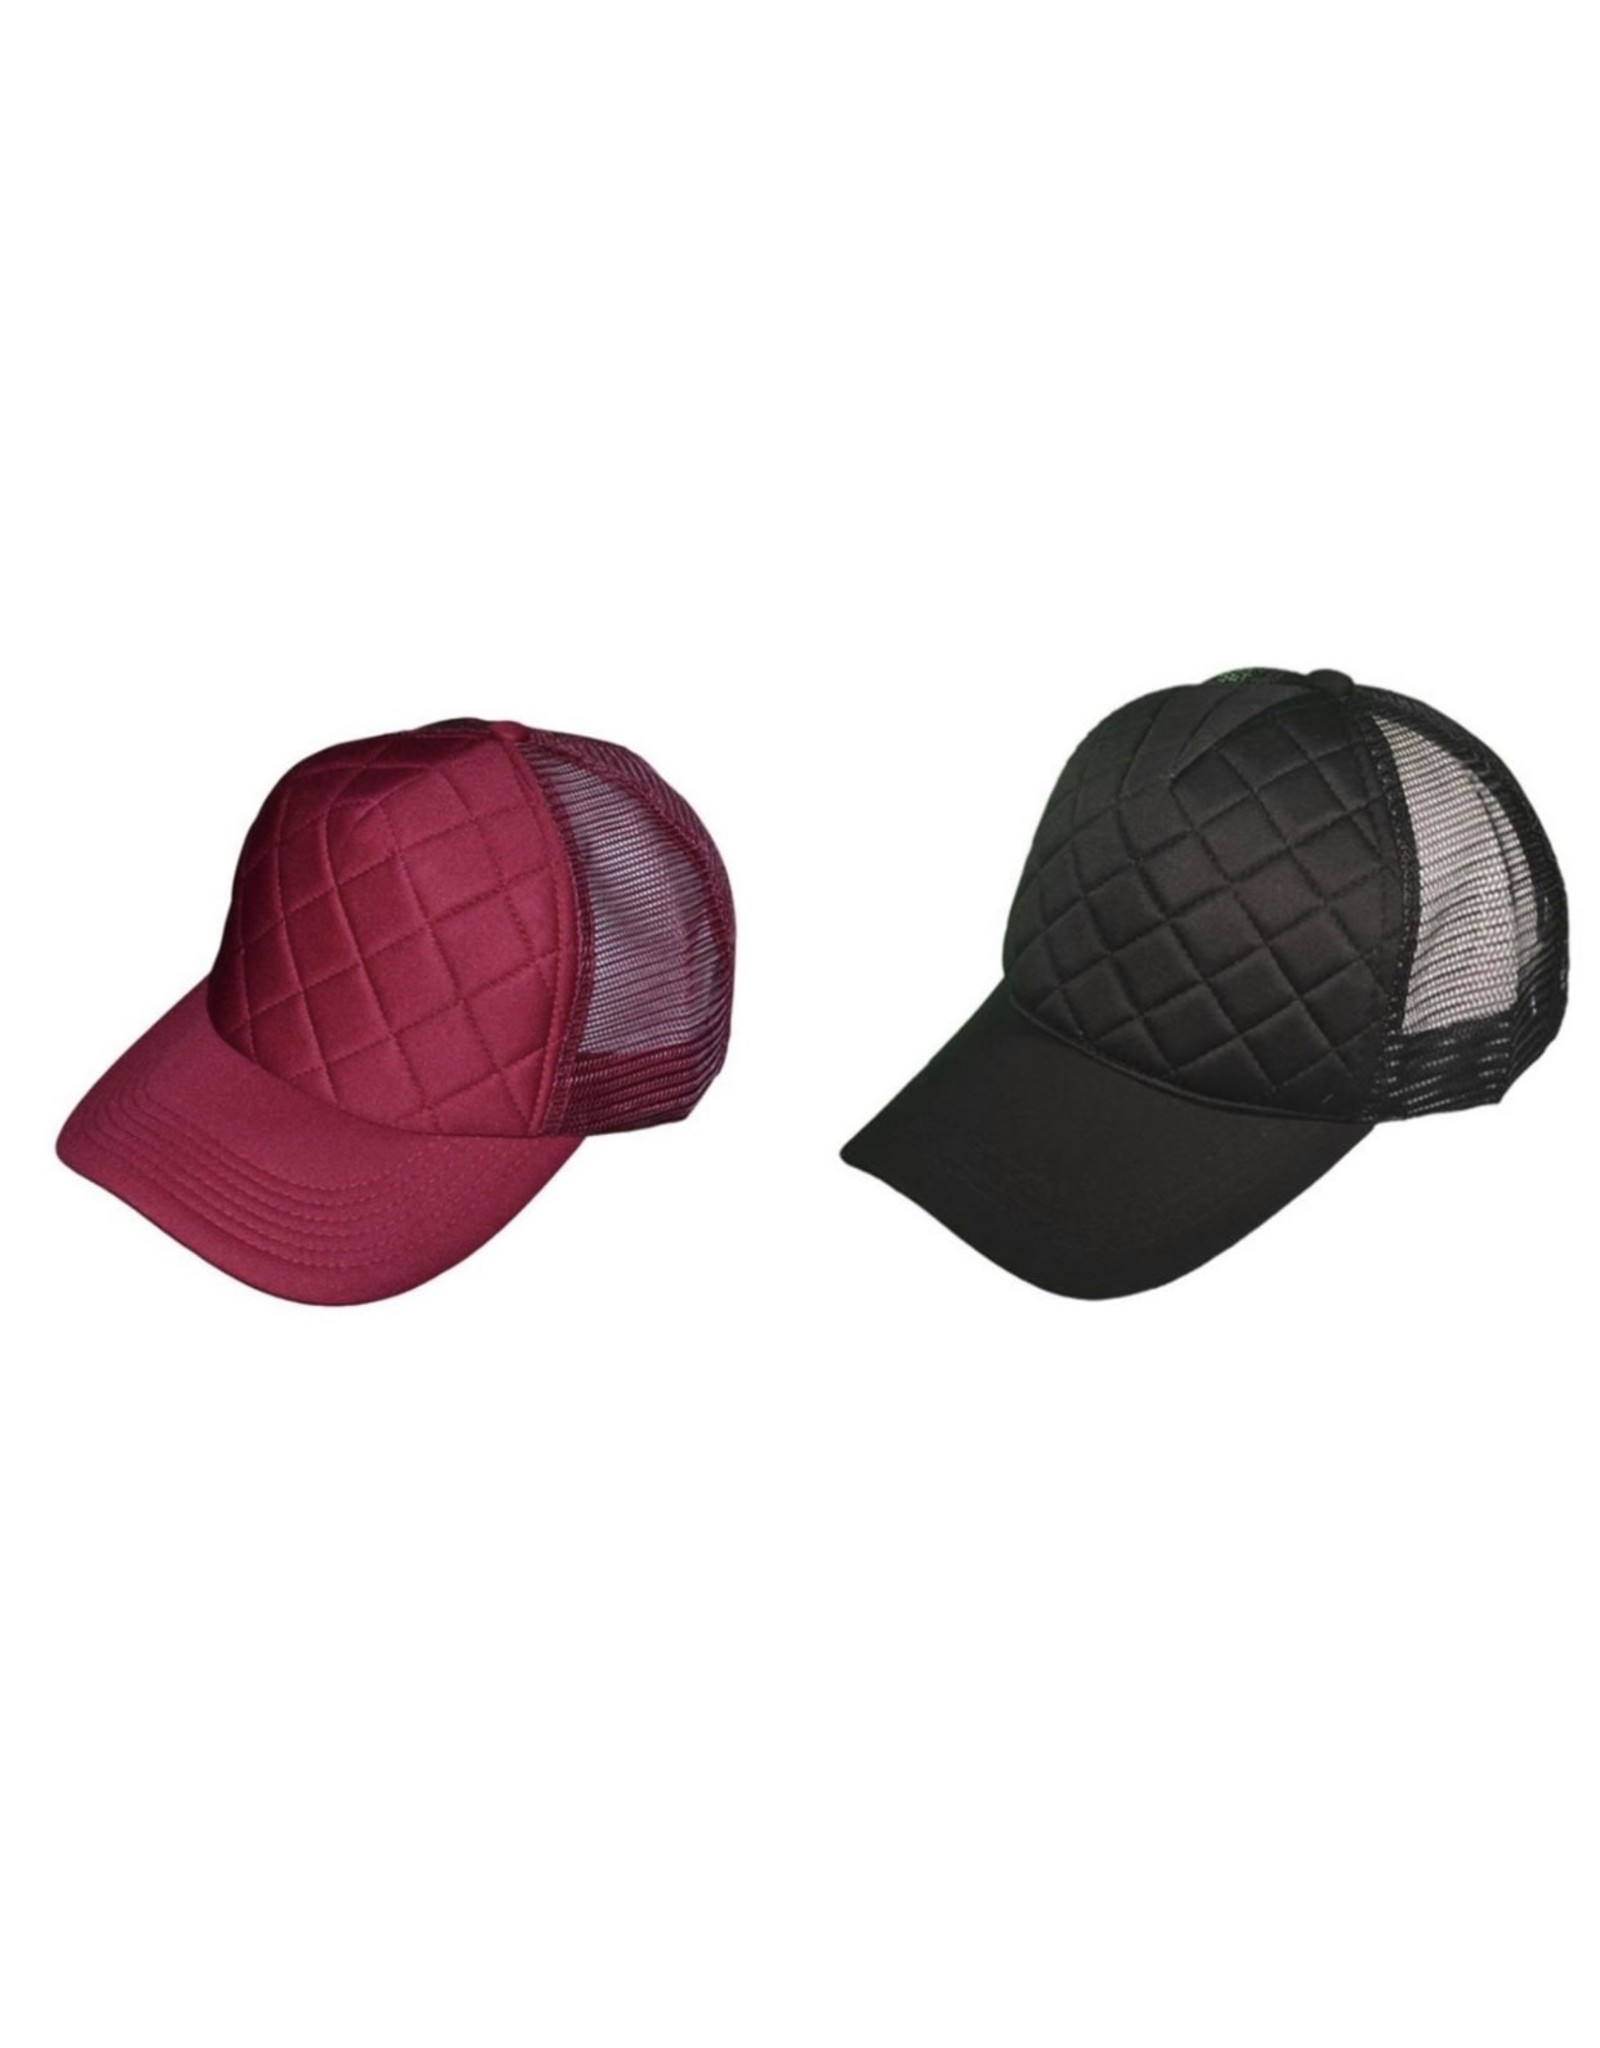 The Ritzy Gypsy QUILTED Foam Trucker Hats